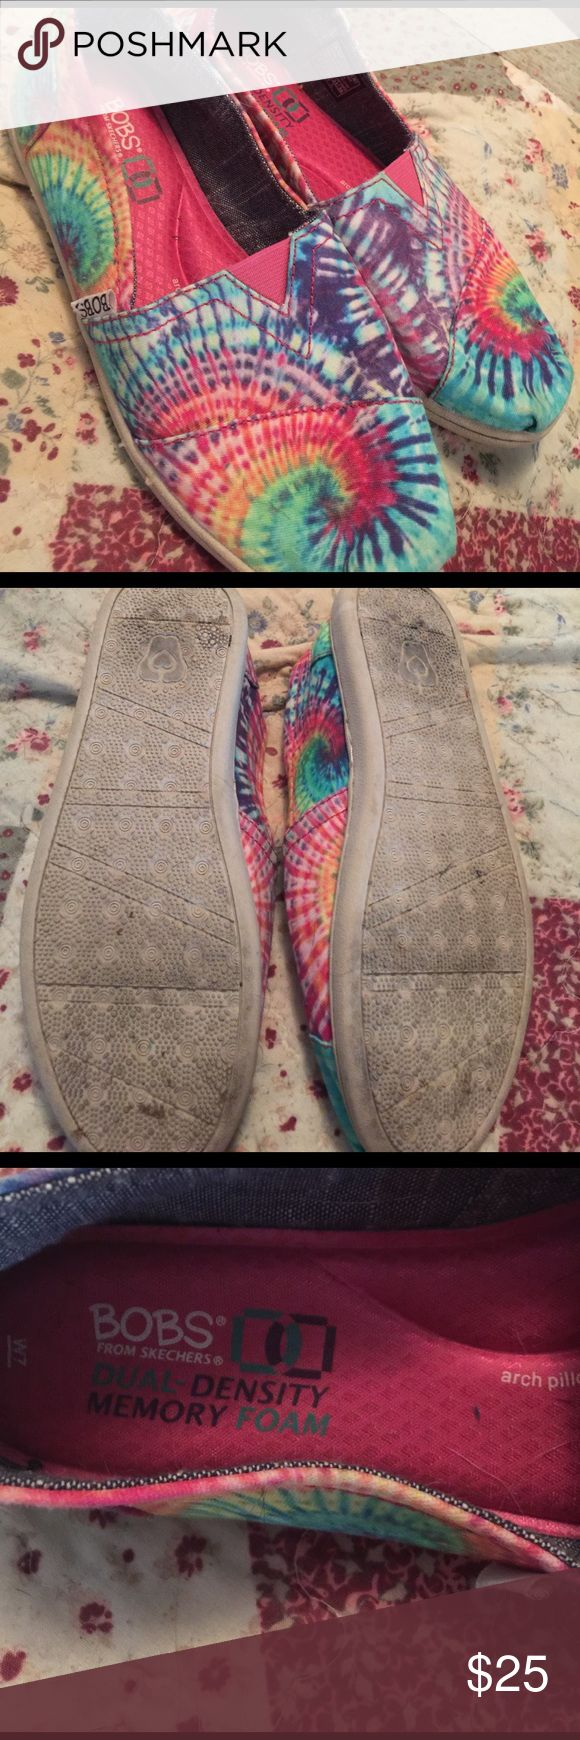 Bobs tie die shoes women's 7 memory foam like new Hard to find! Worn a few times Skechers Shoes Flats & Loafers